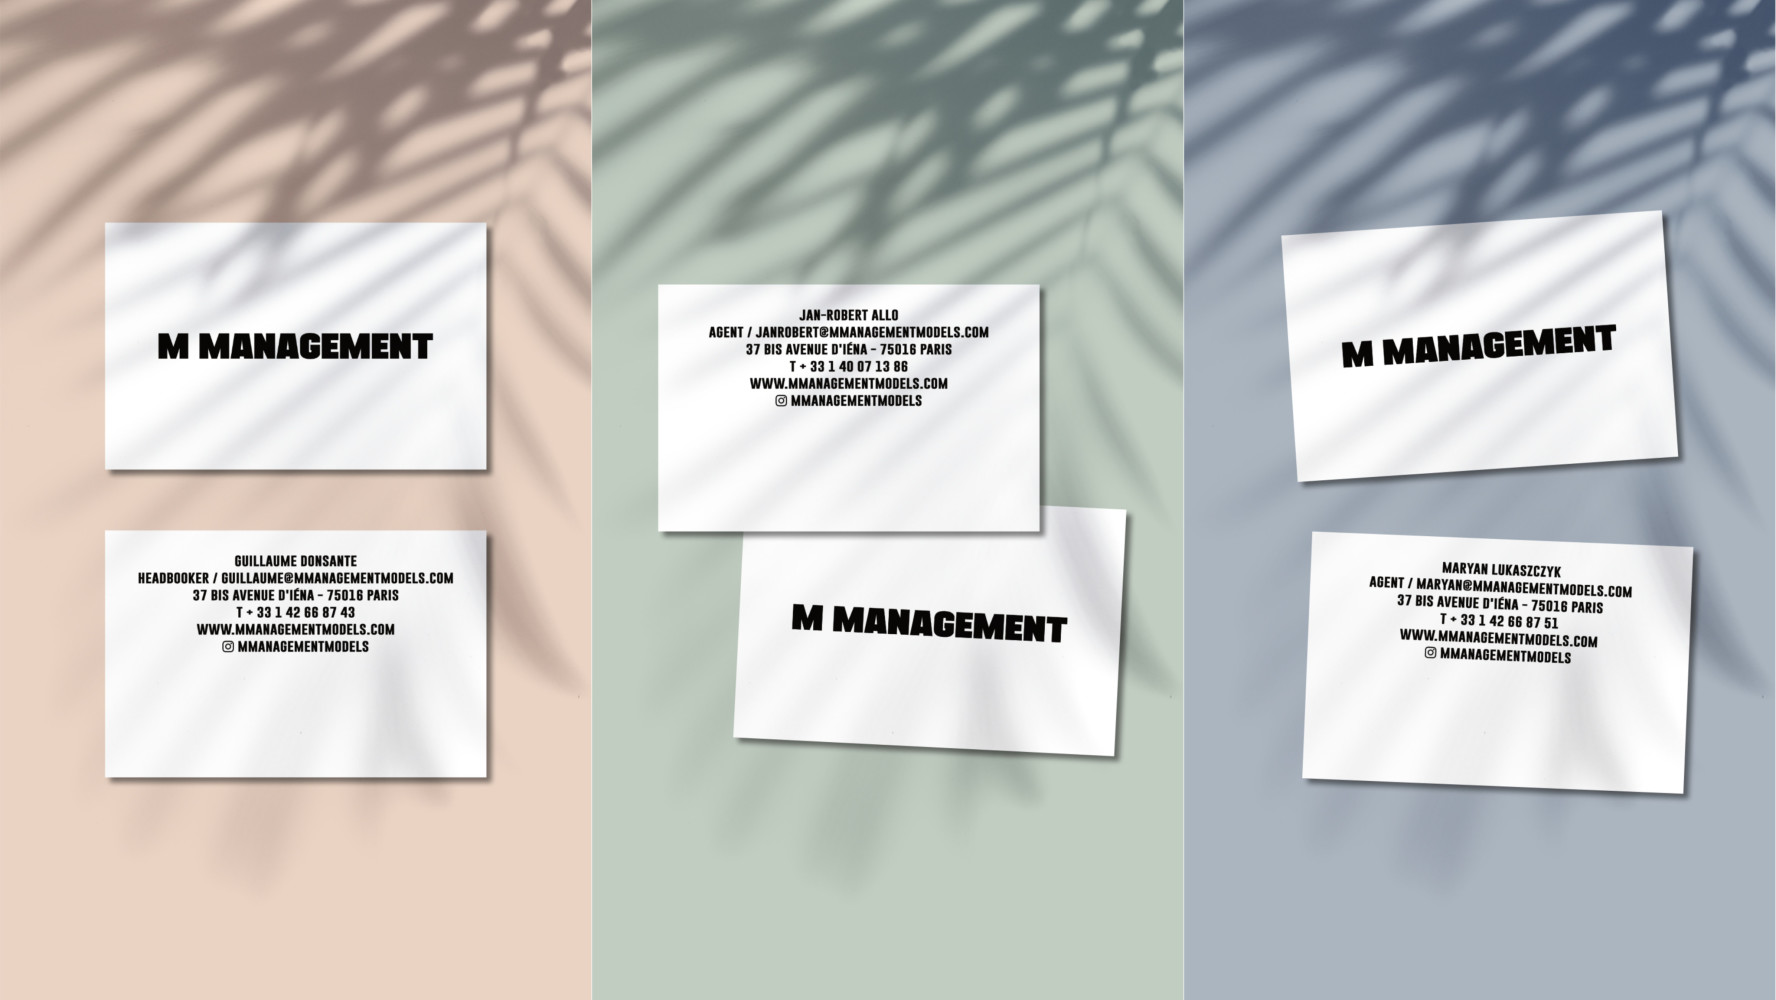 M MANAGEMENT MODELS